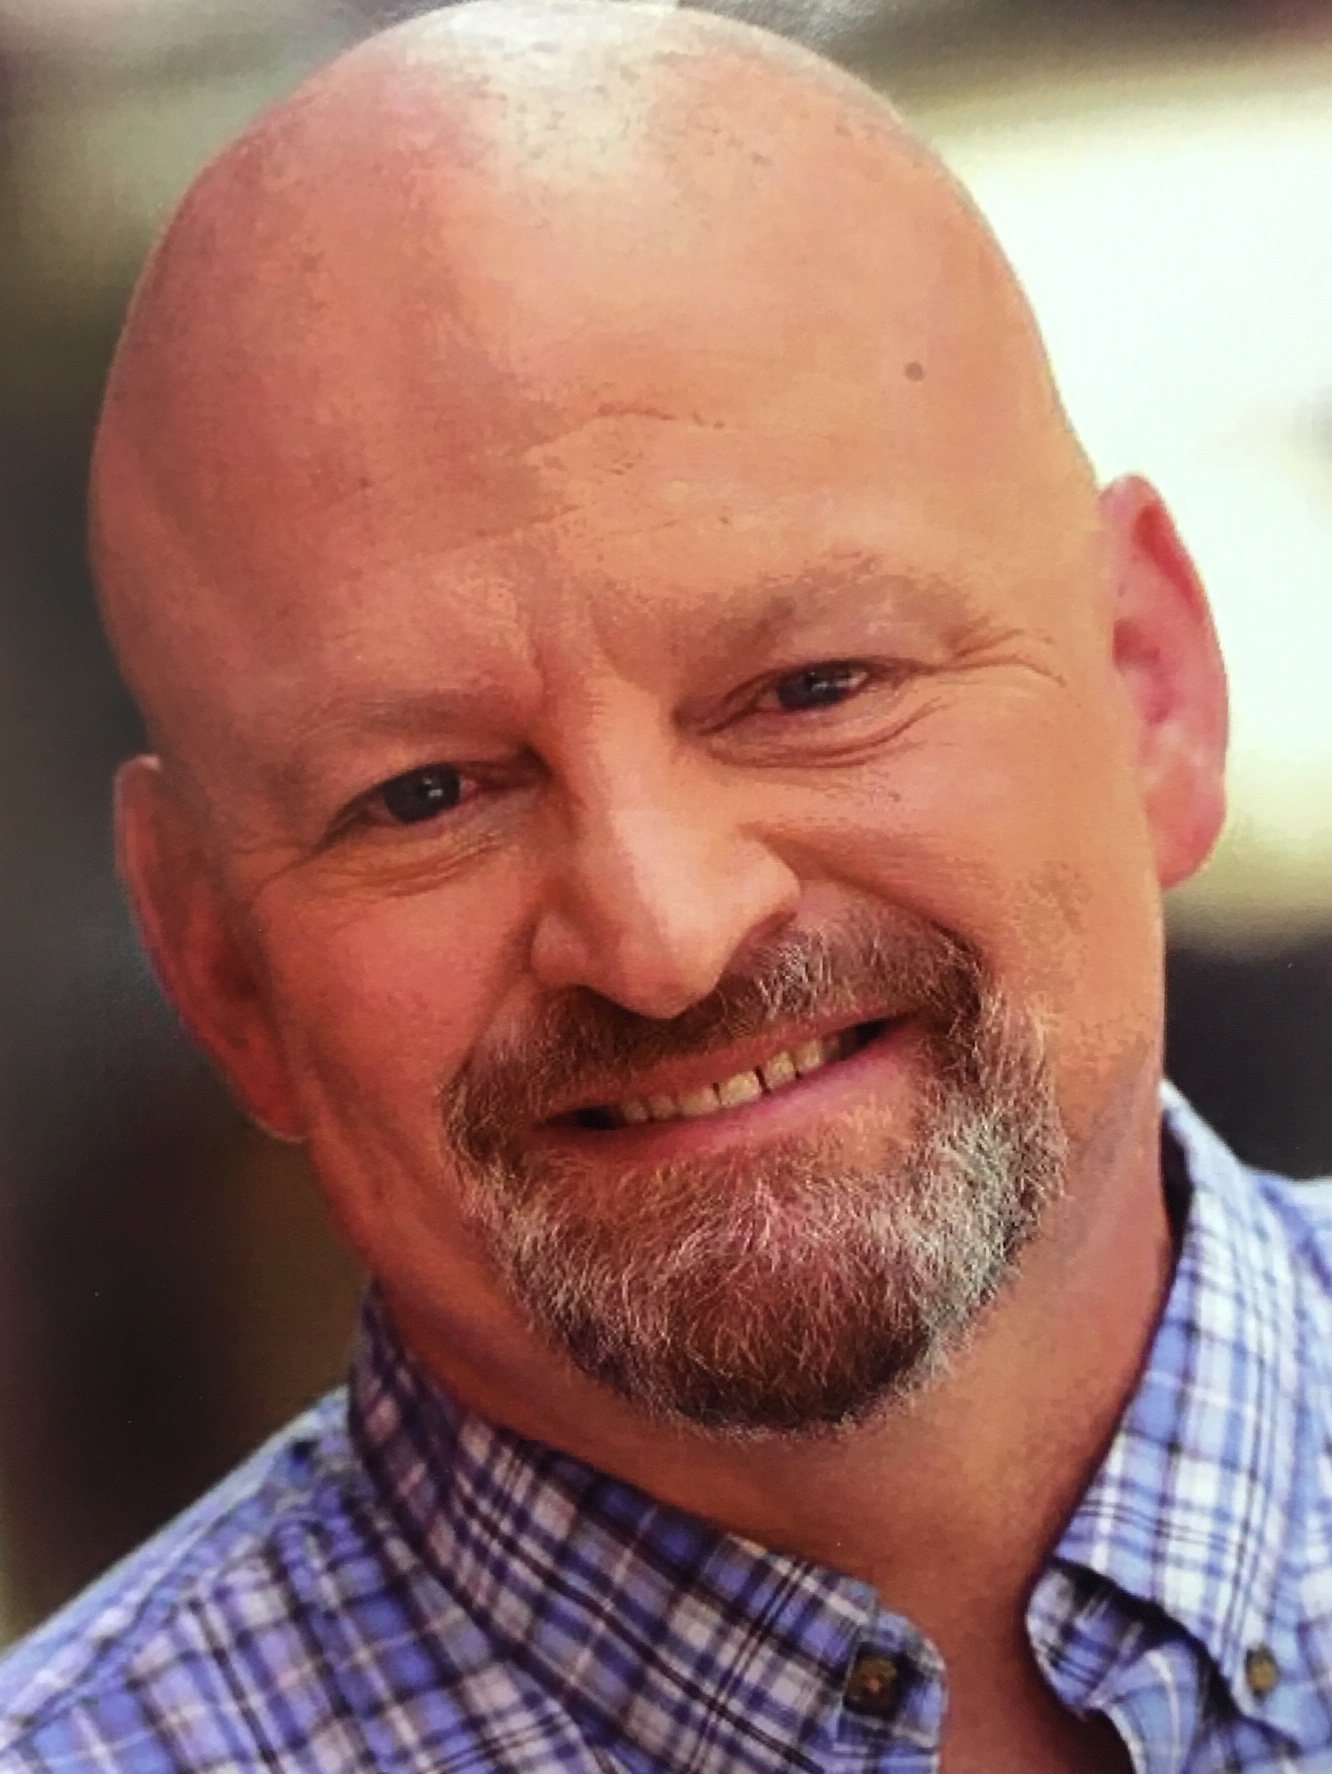 Patrick M. | Actor